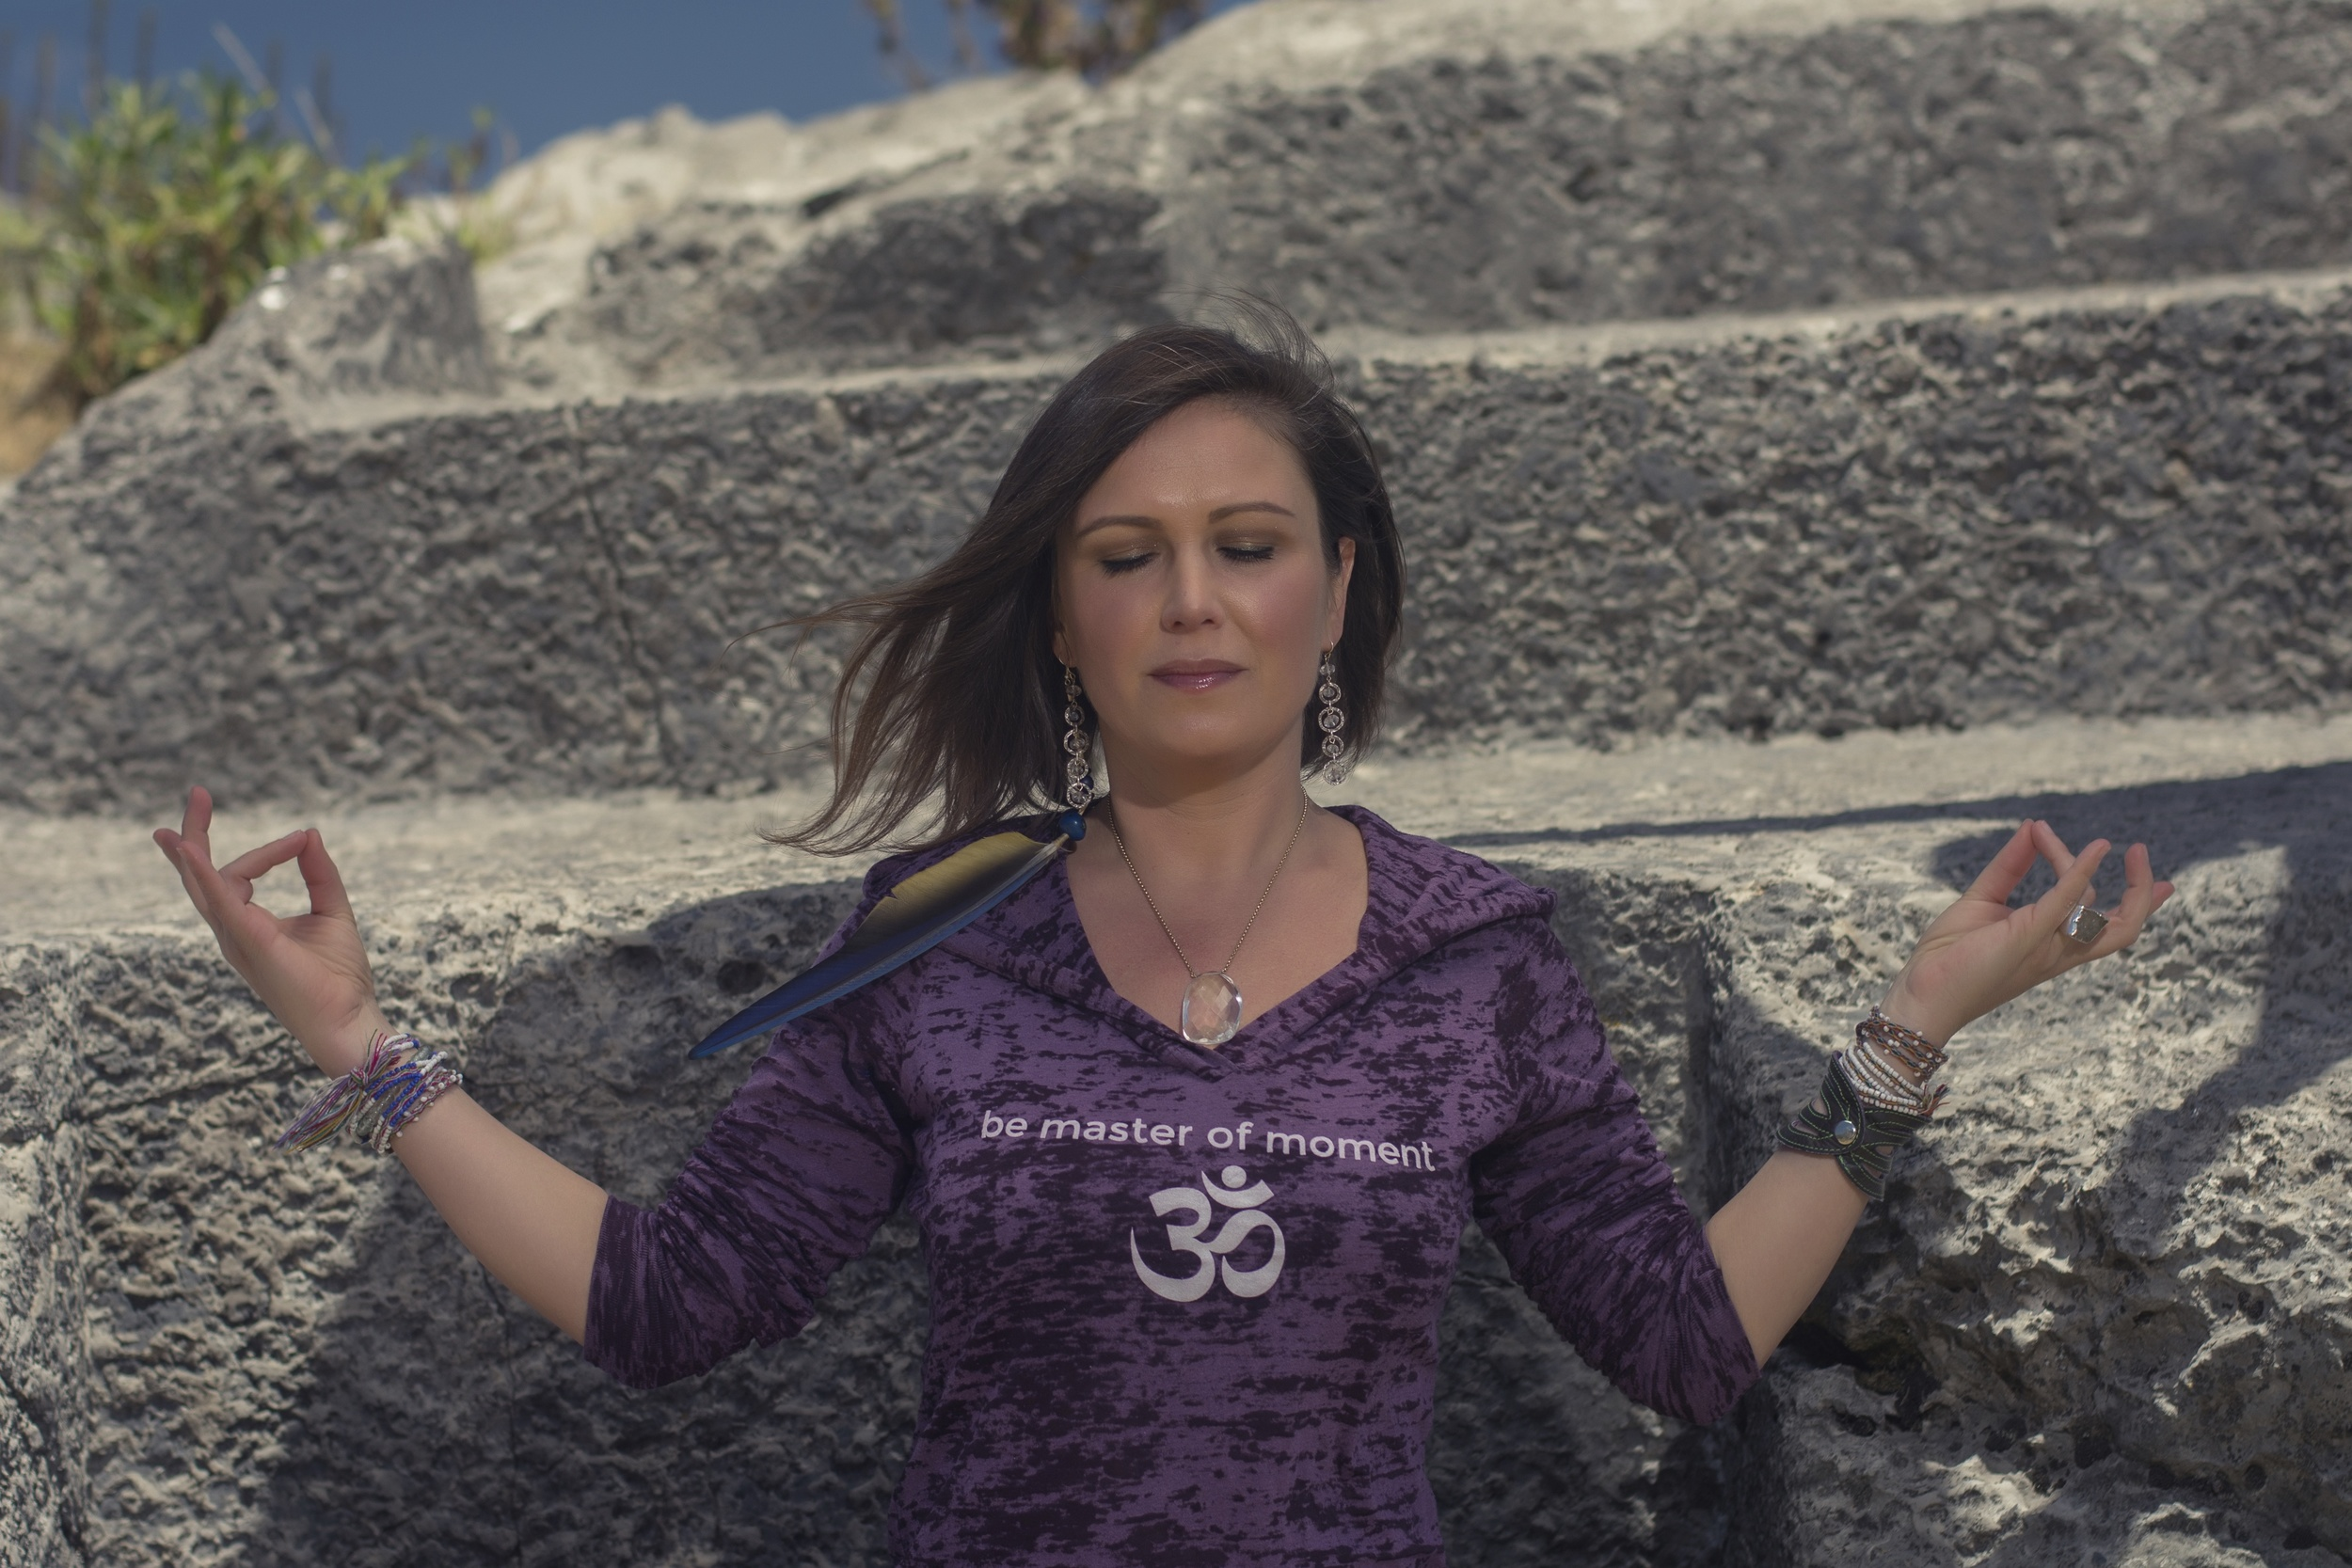 be-master-of-moment-om-burnout-hoodie-racerback-tank-yoga-explore-deeply-chloe-rain